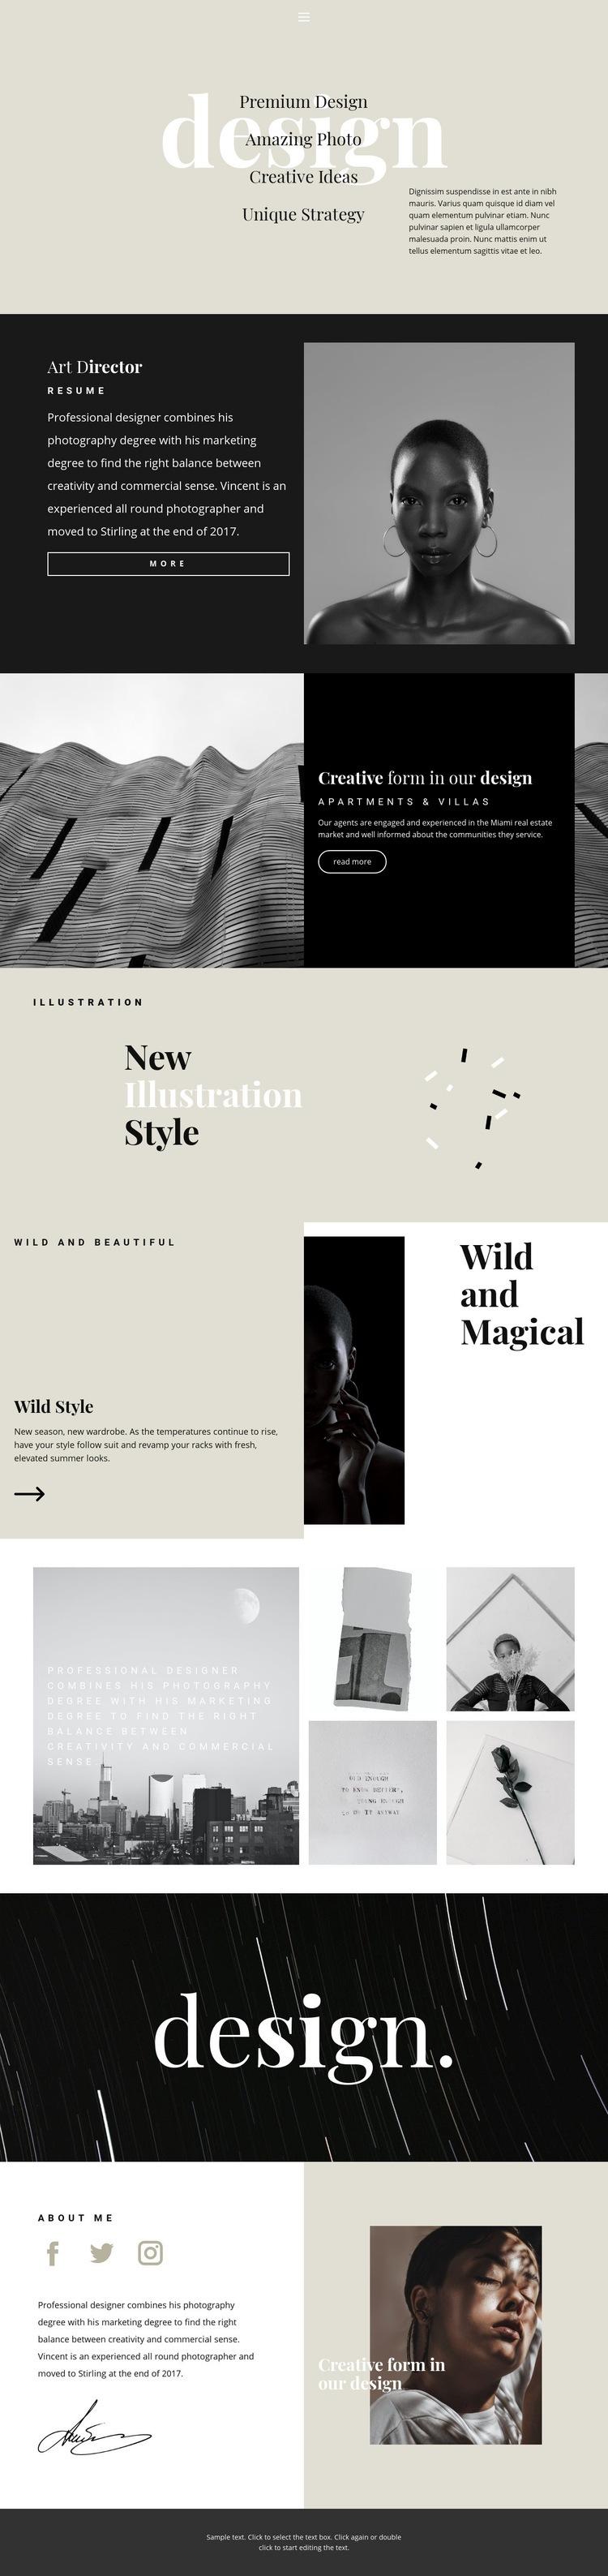 Directions of design studio Web Page Designer